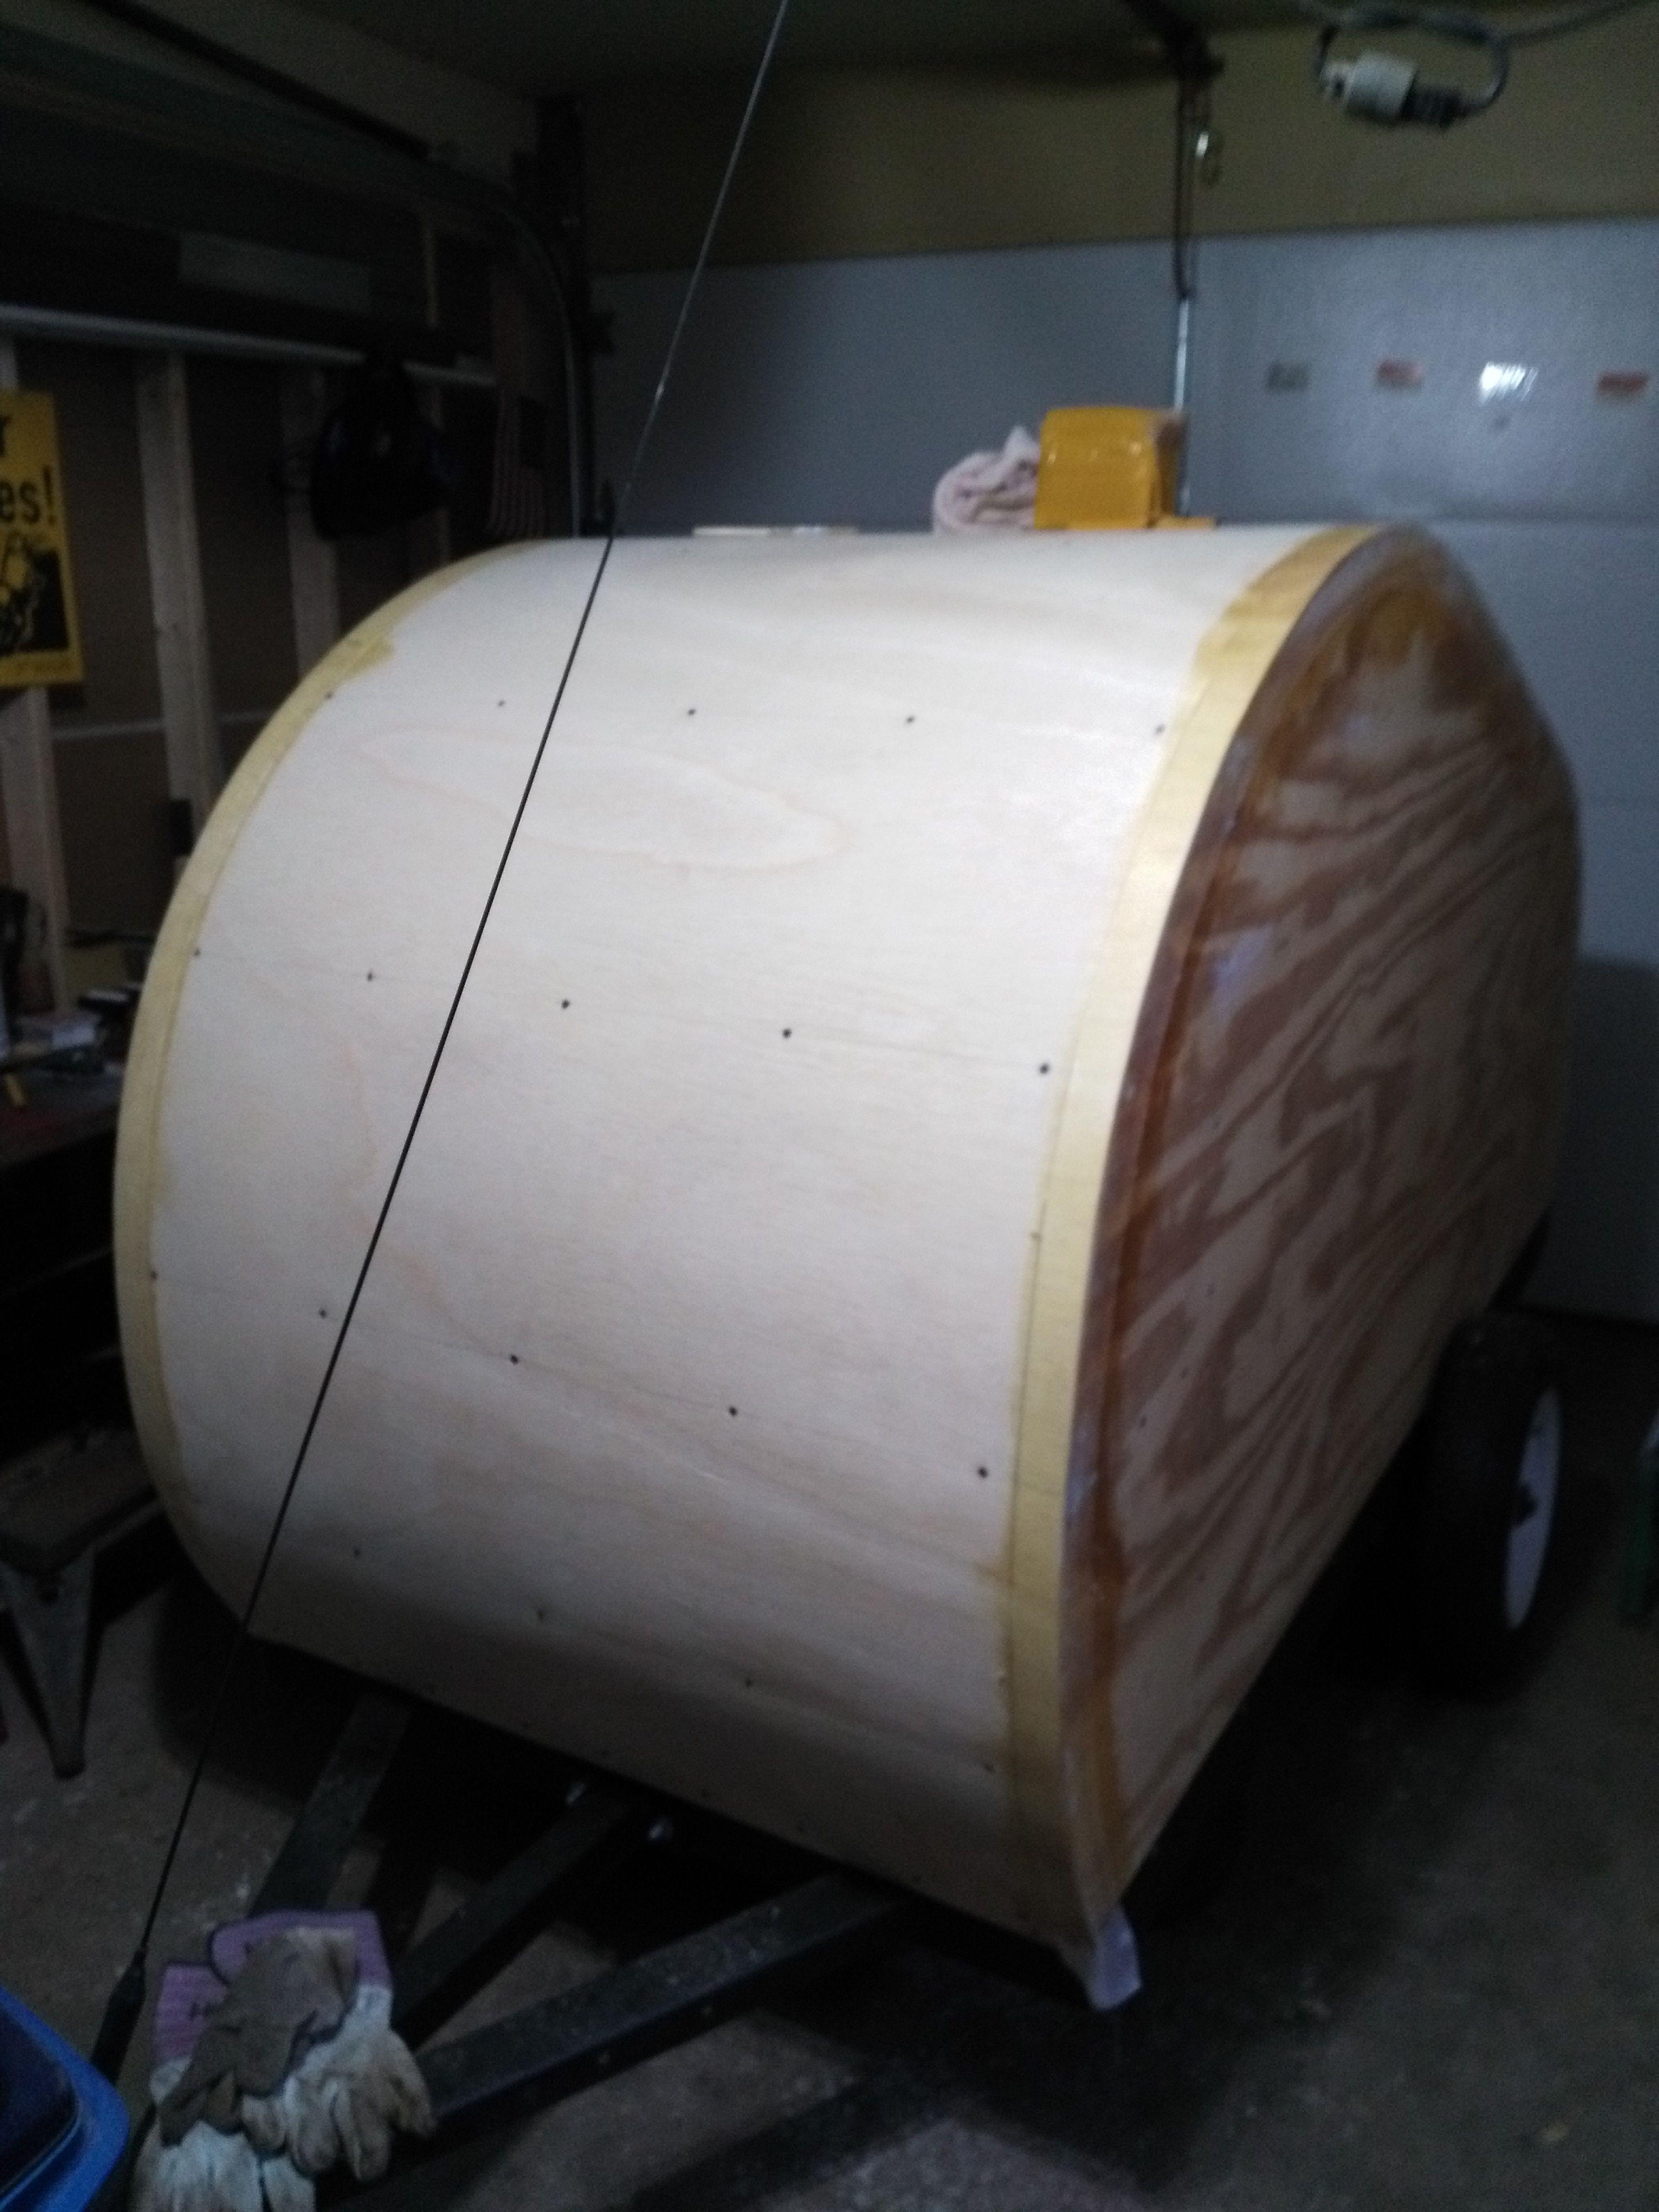 Fiberglassing Reinforcement Glass Tape Plywood Sheets Teardrop Camper